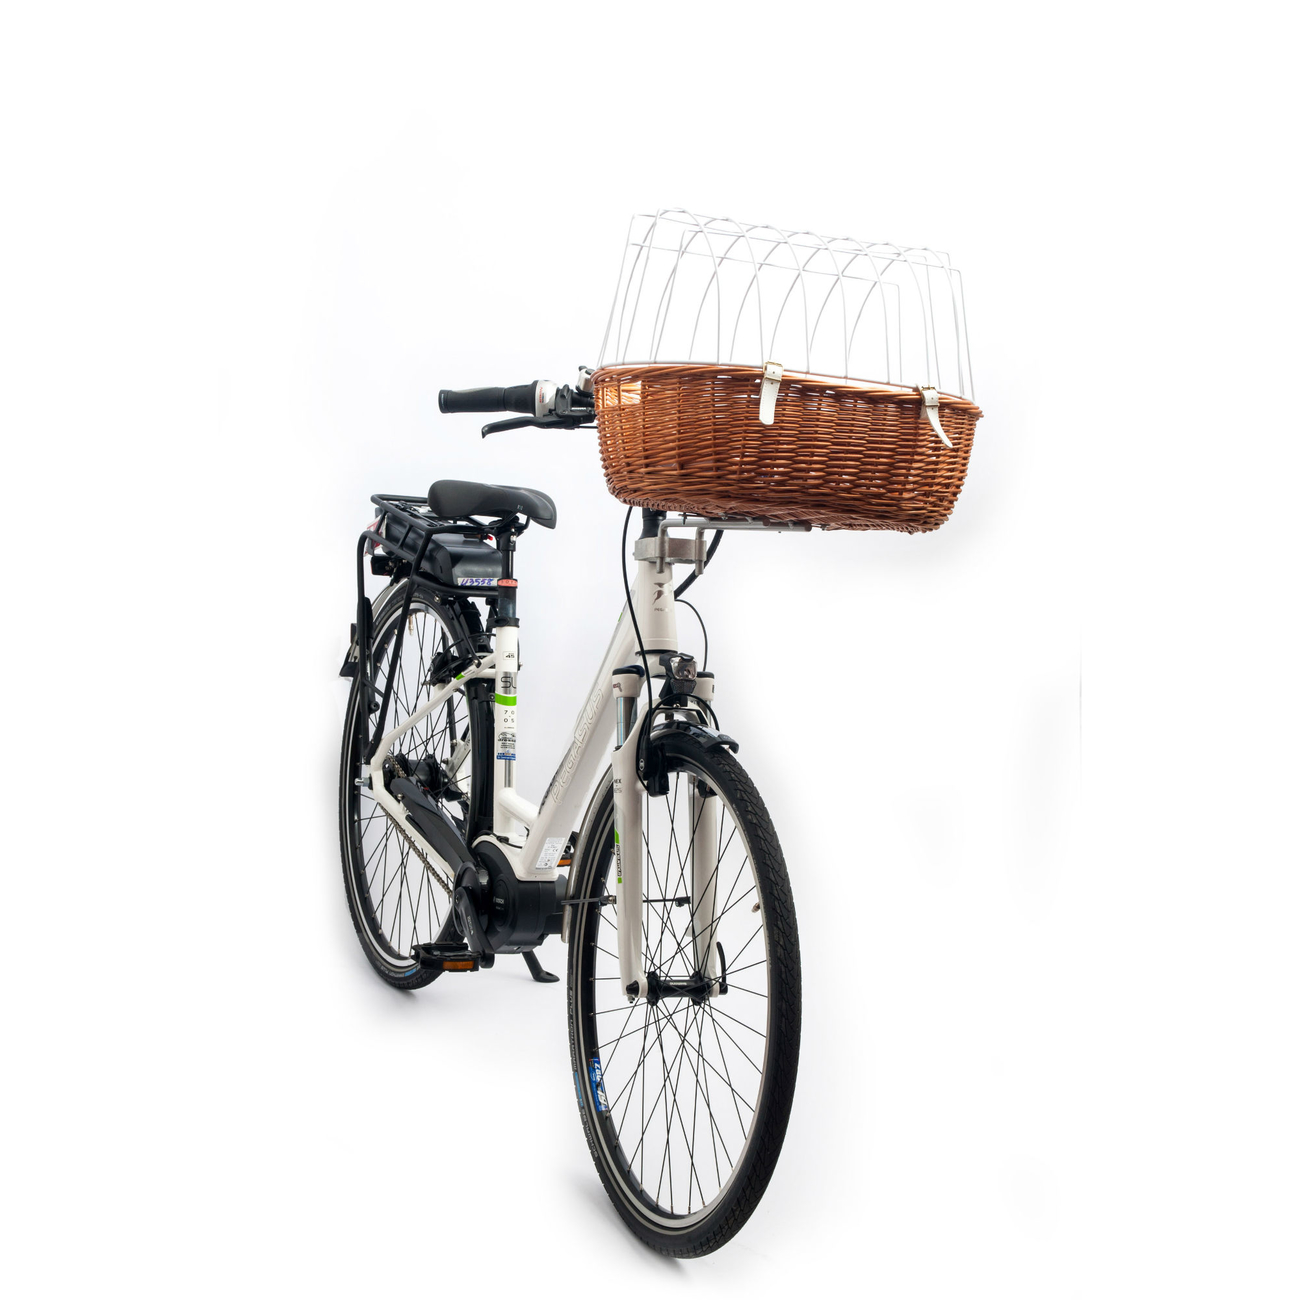 Aumüller E-Bike Hunde Fahrradkorb Standard vorne, Bild 10